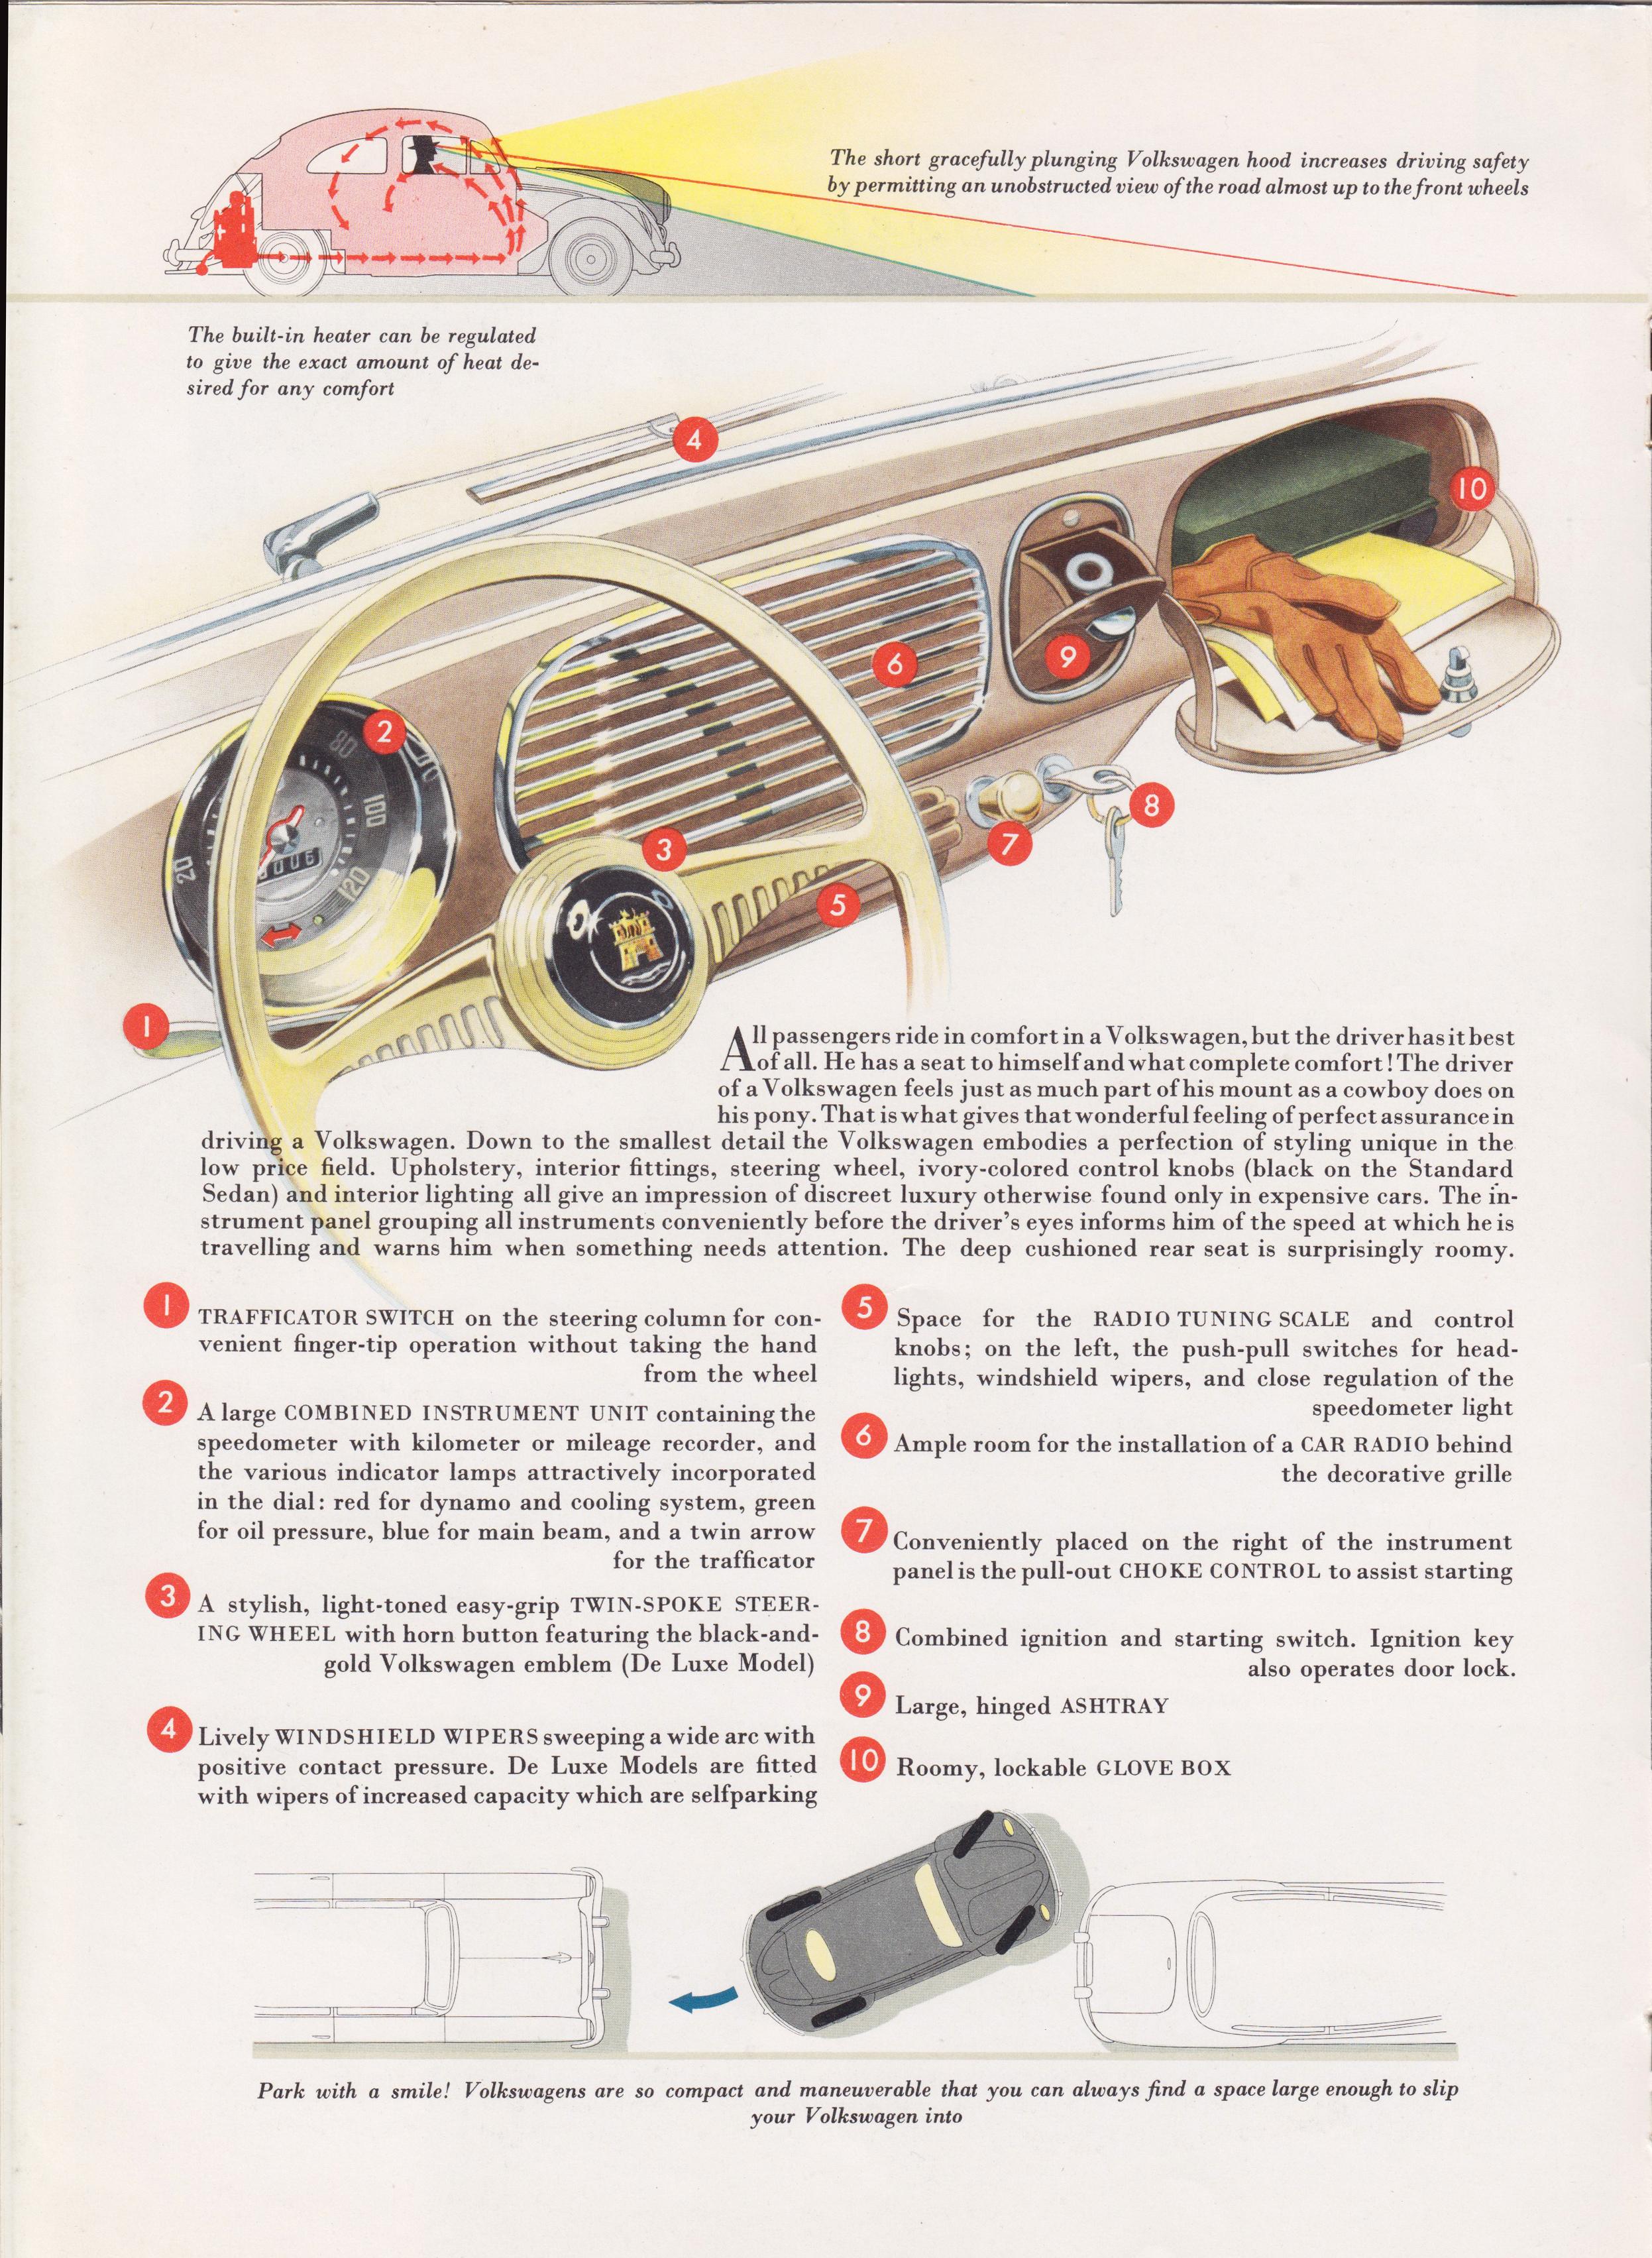 TheSamba com :: VW Archives - 1953 VW Beetle Sales Brochure